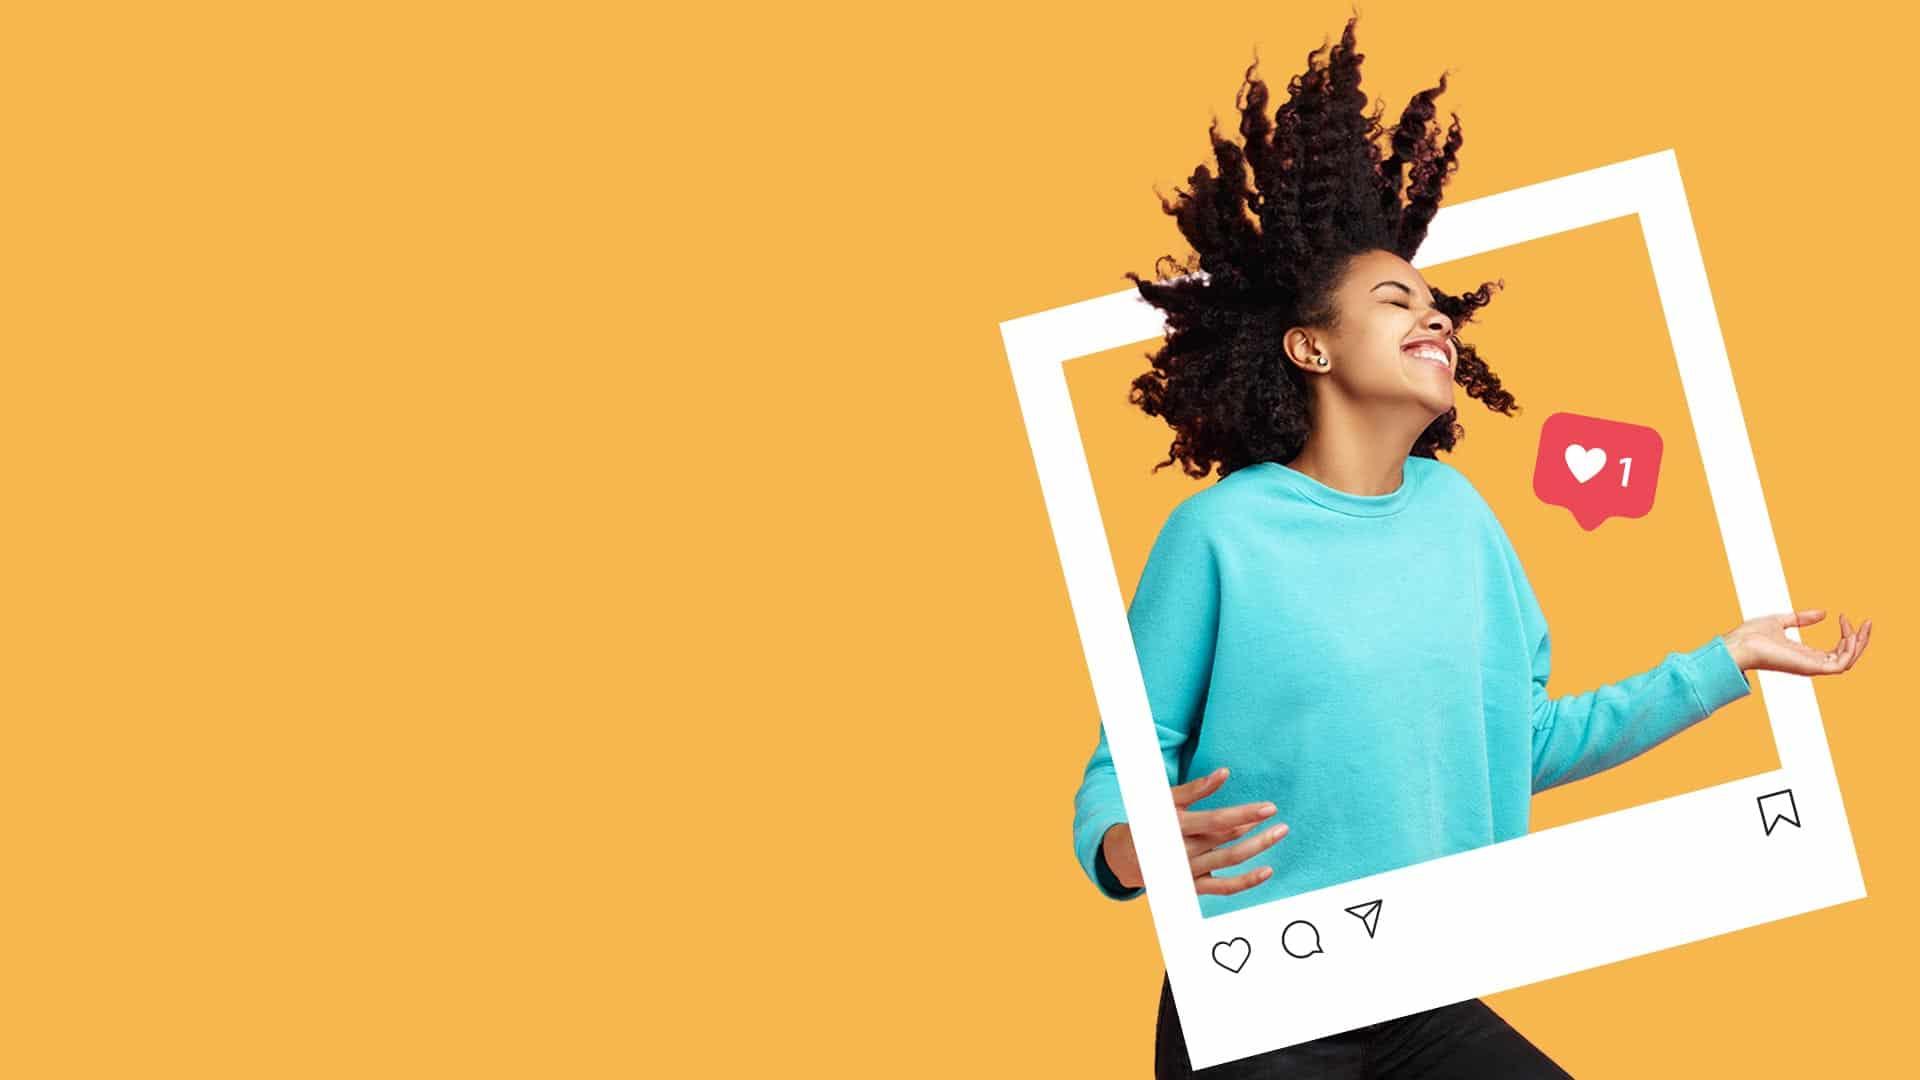 Instagram: engagement, engagement, engagement!